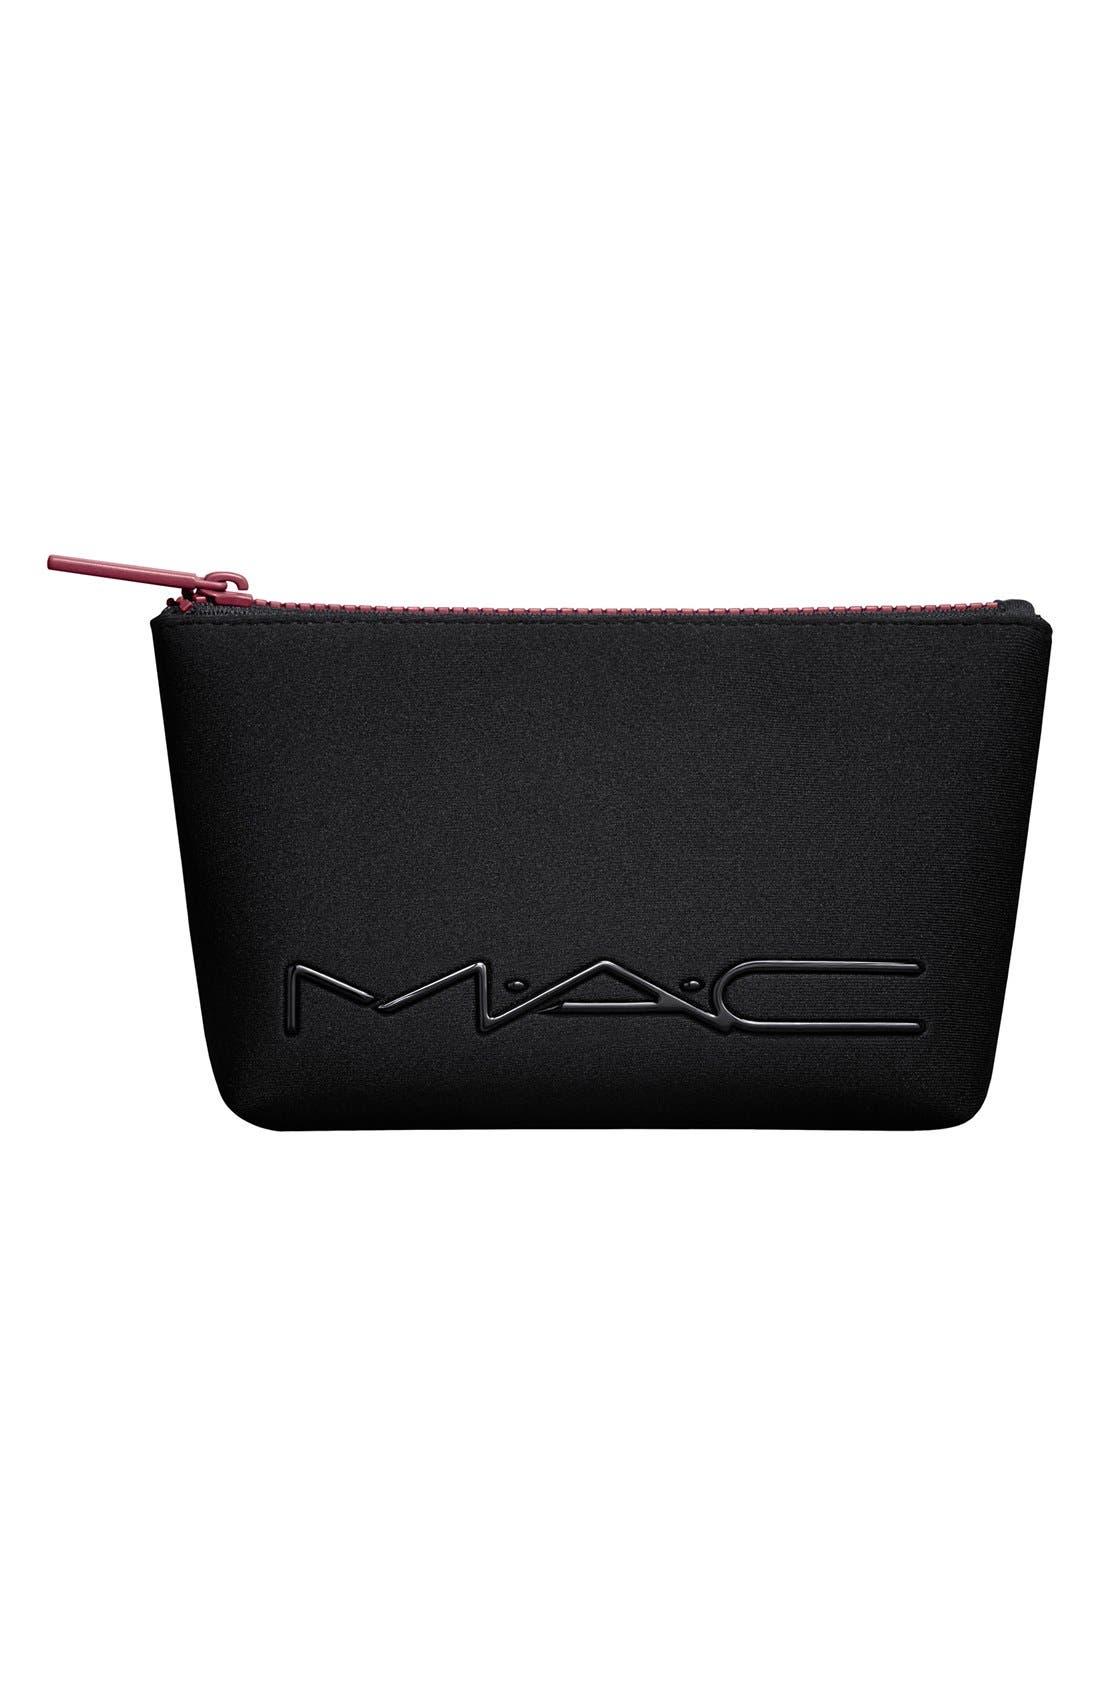 MAC 'Look in a Box - Sassy Siren' Burgundy Lip & Eye Kit,                             Alternate thumbnail 3, color,                             No Color